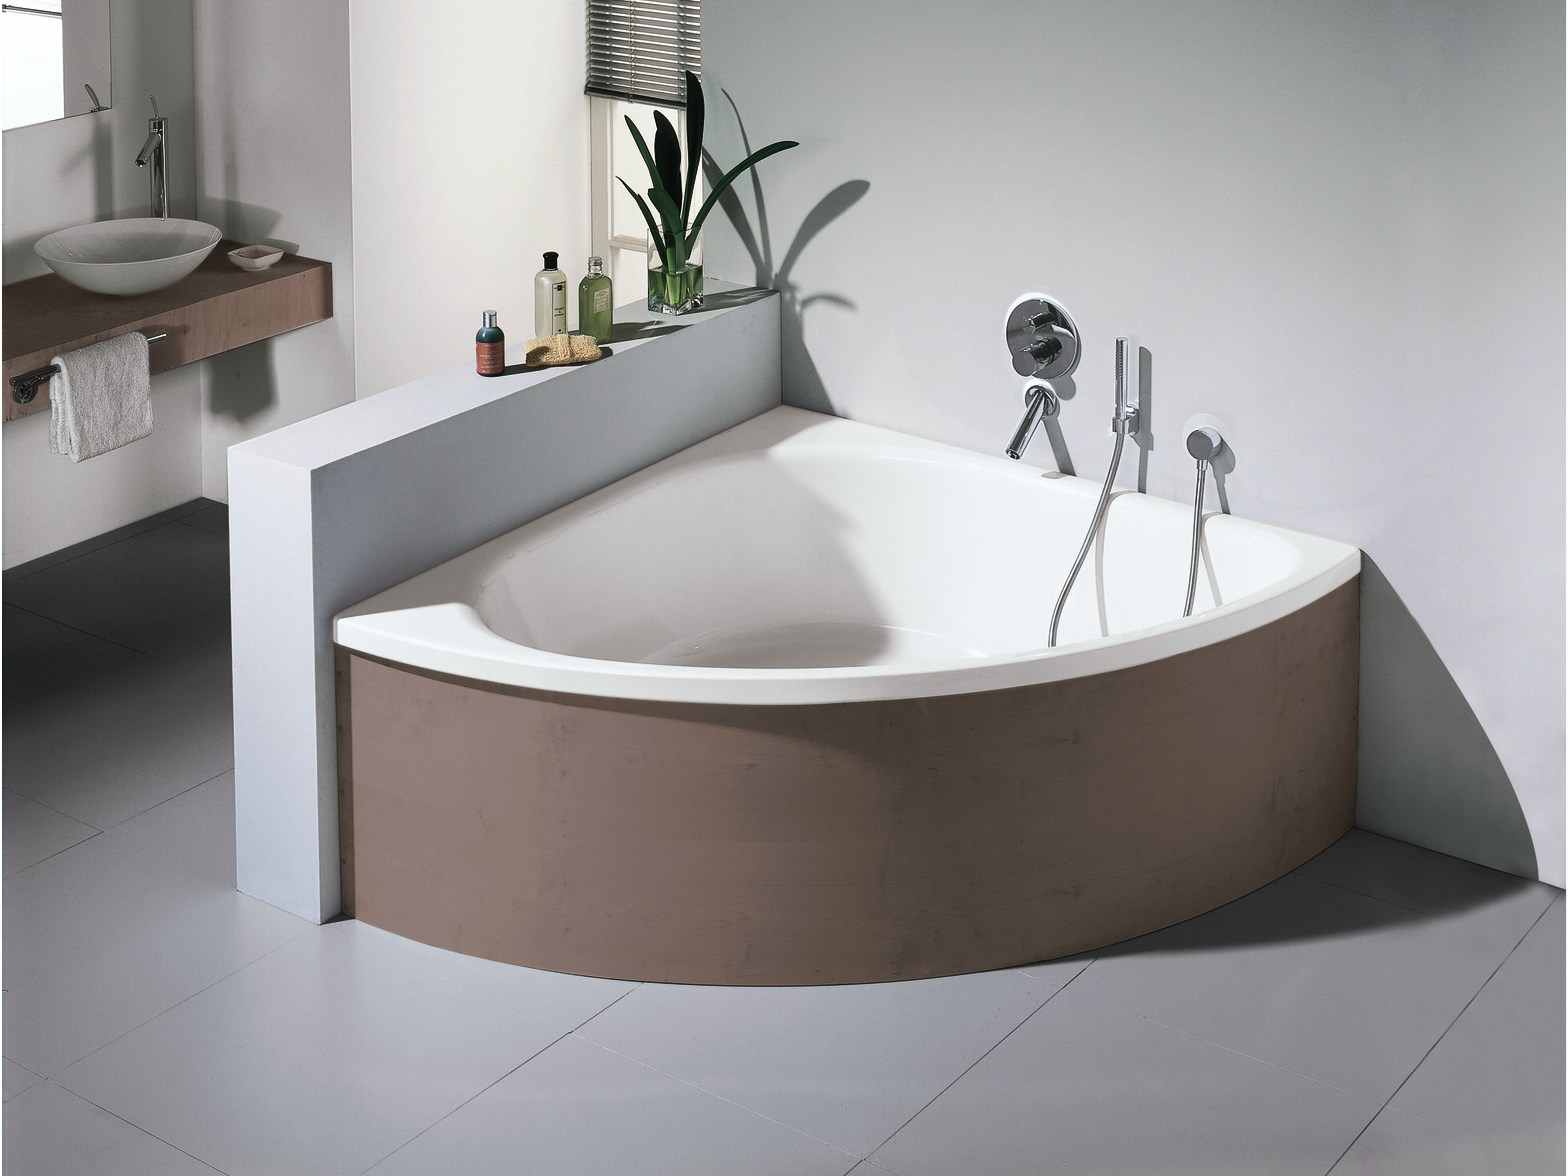 Good vasca da bagno in acciaio smaltato bettelux oval iv - Vasca da bagno piccola misure ...